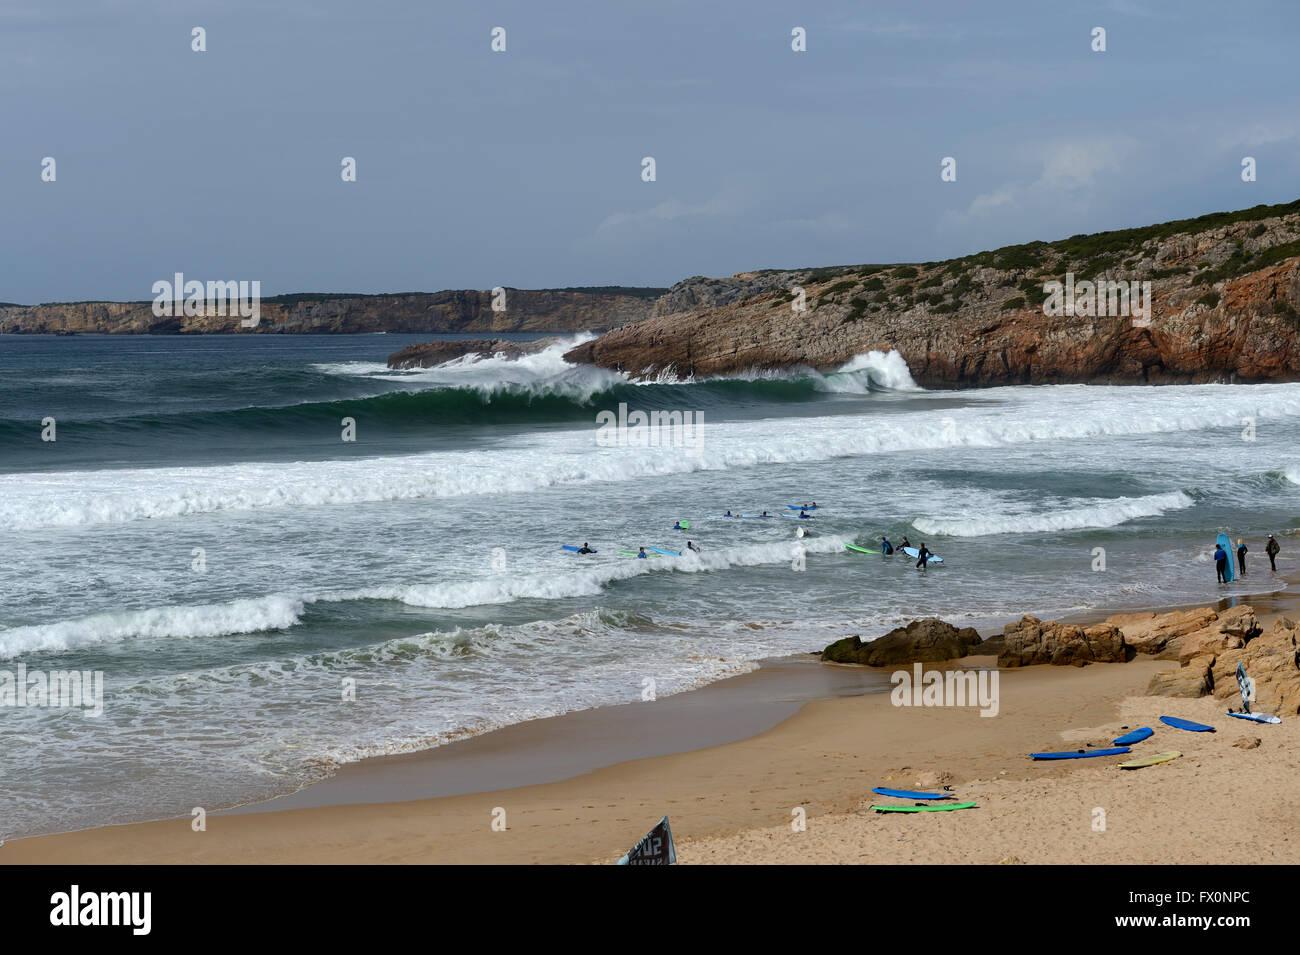 surf school in the shallows praia do Zavial - Stock Image